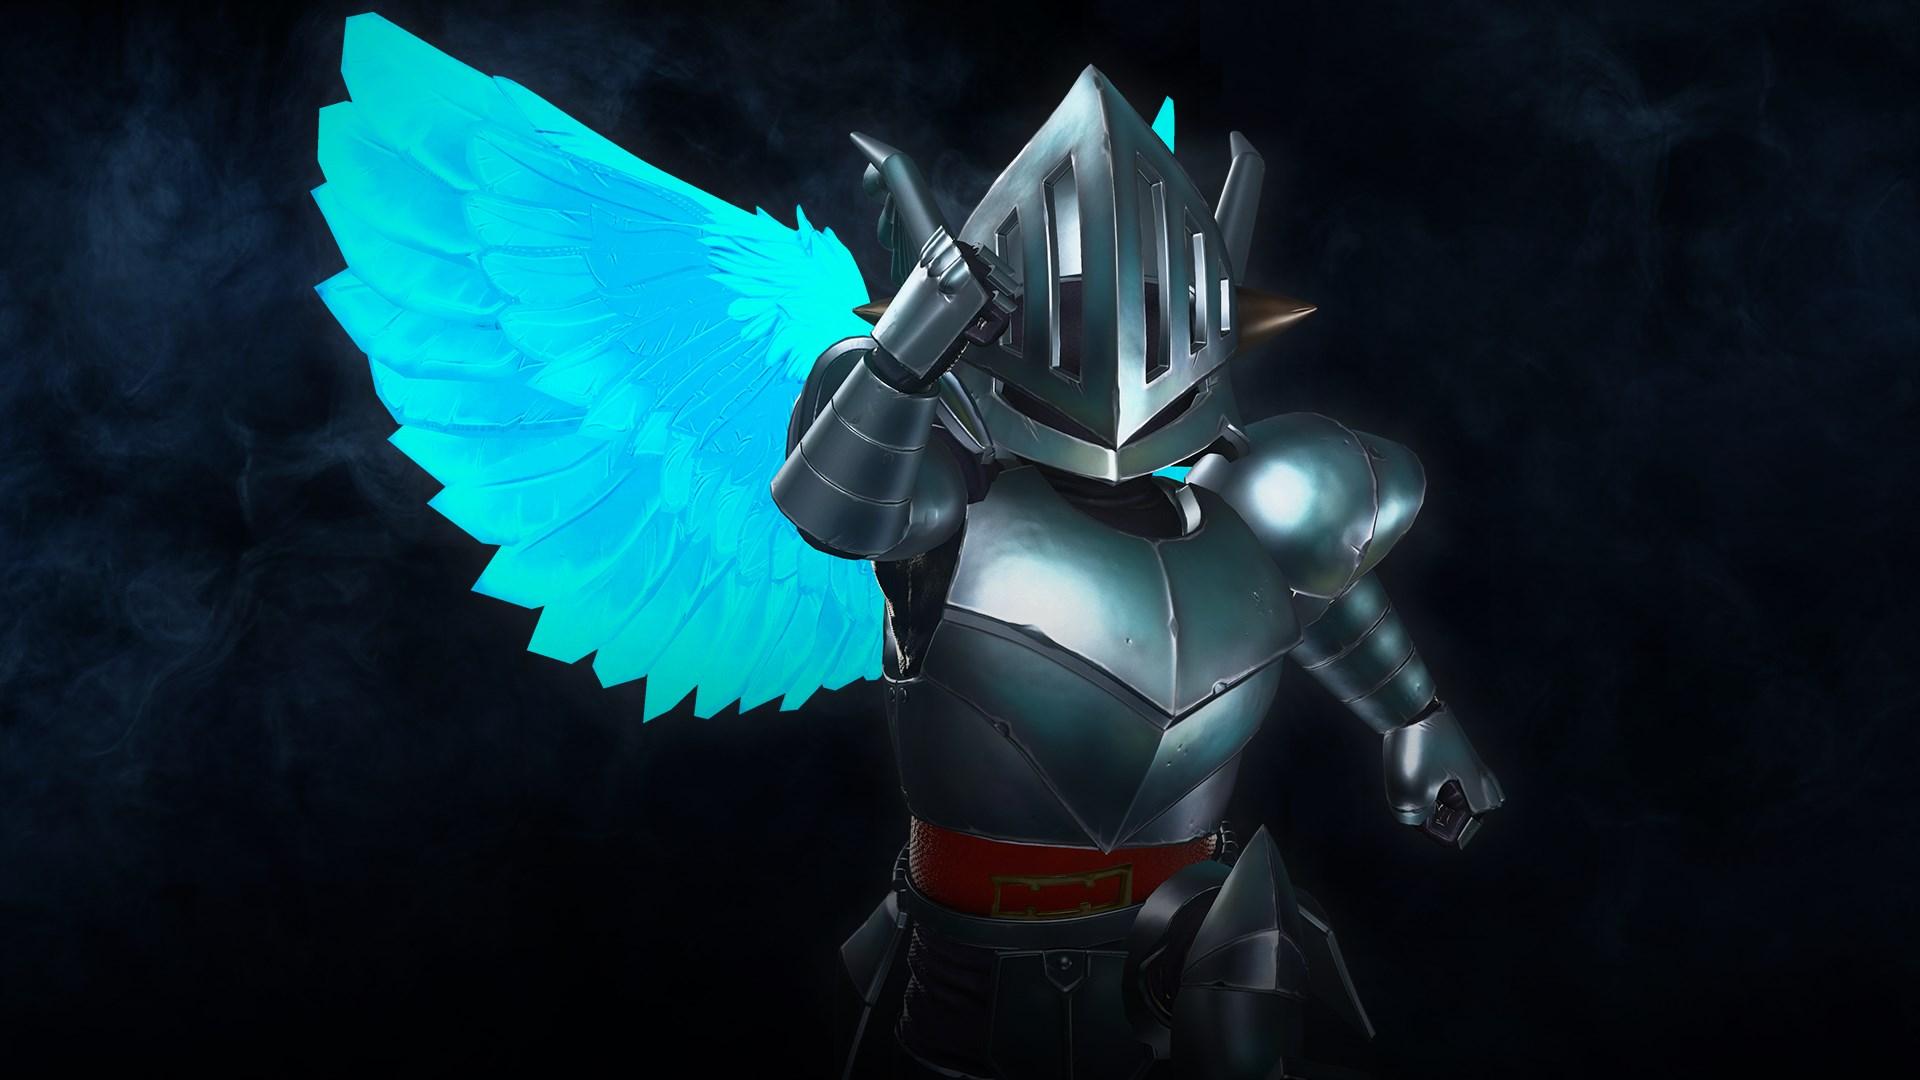 Marvel vs. Capcom: Infinite - Arthur Fallen Angel Armor Costume